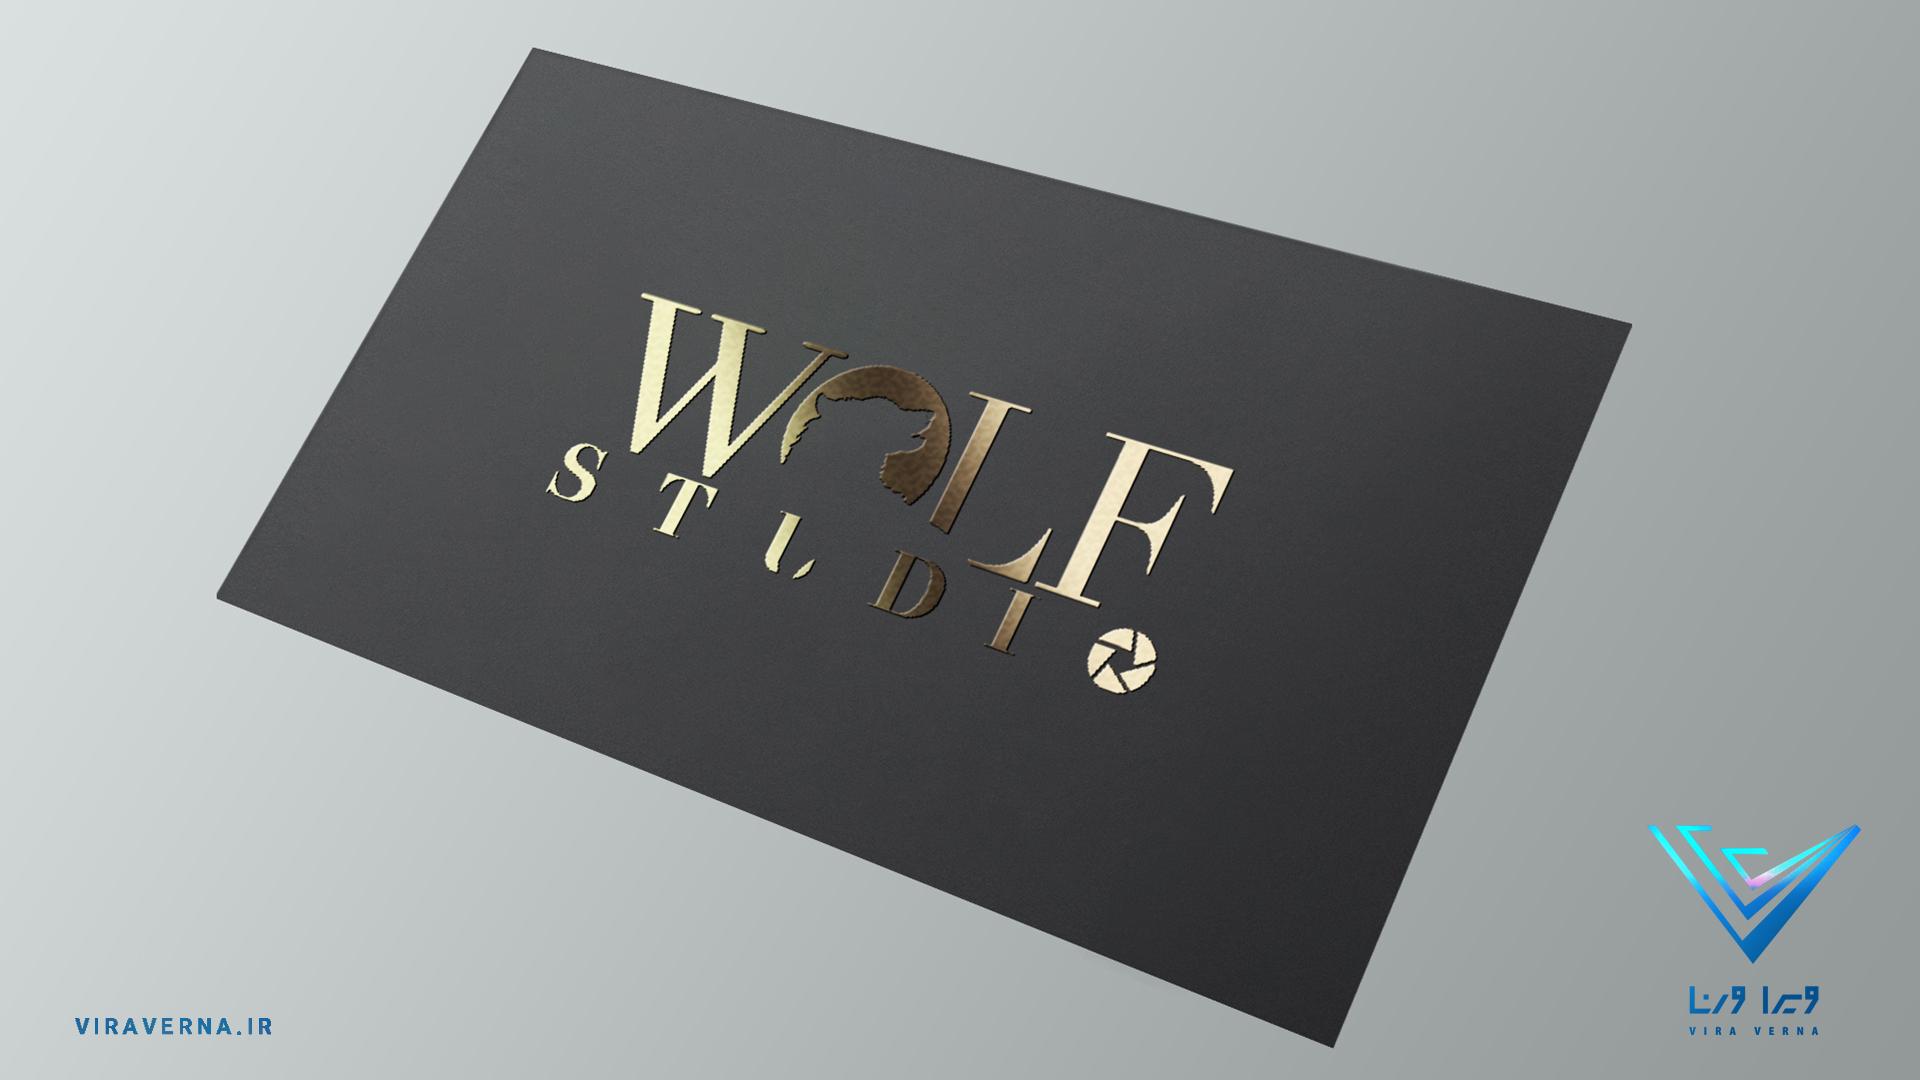 wolf-studio-04